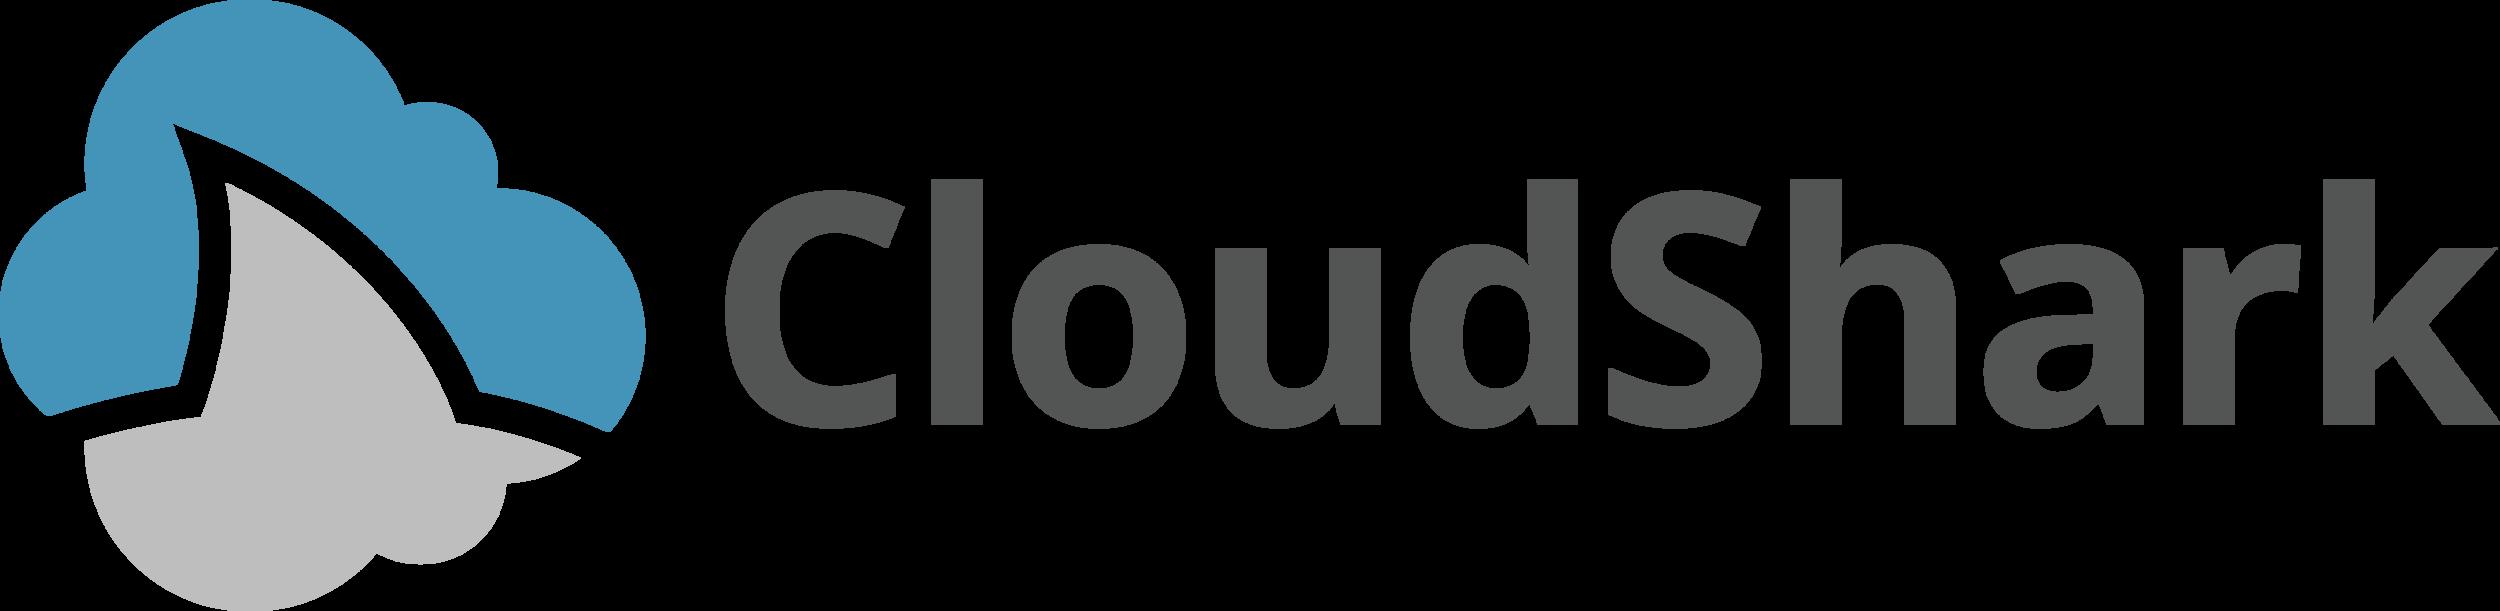 cloudshark-logo-color.png